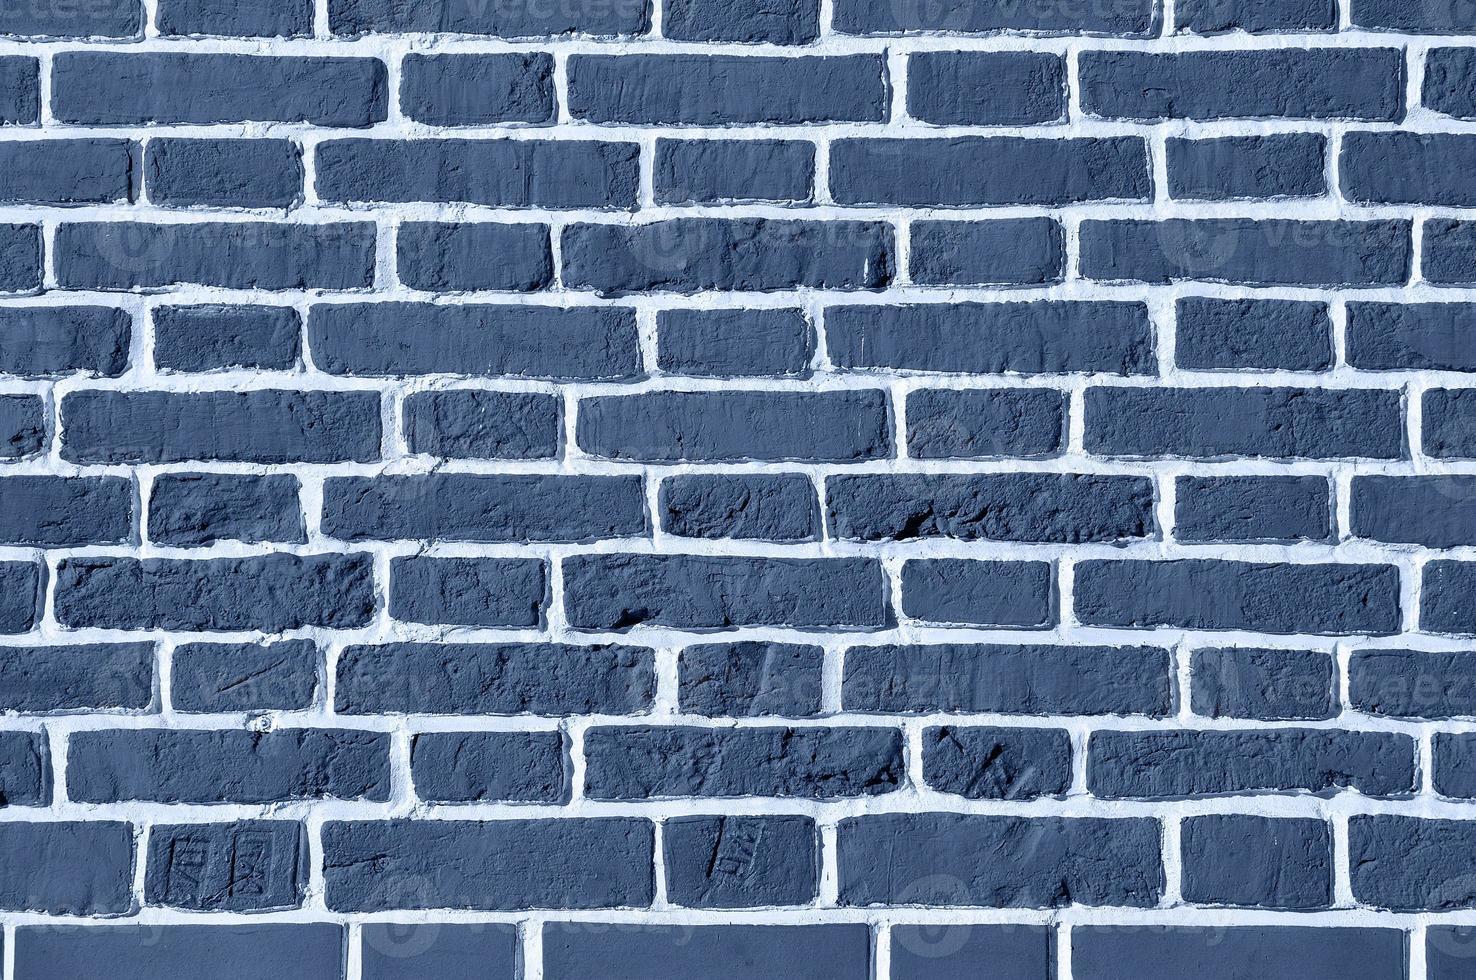 tijolos azuis foto